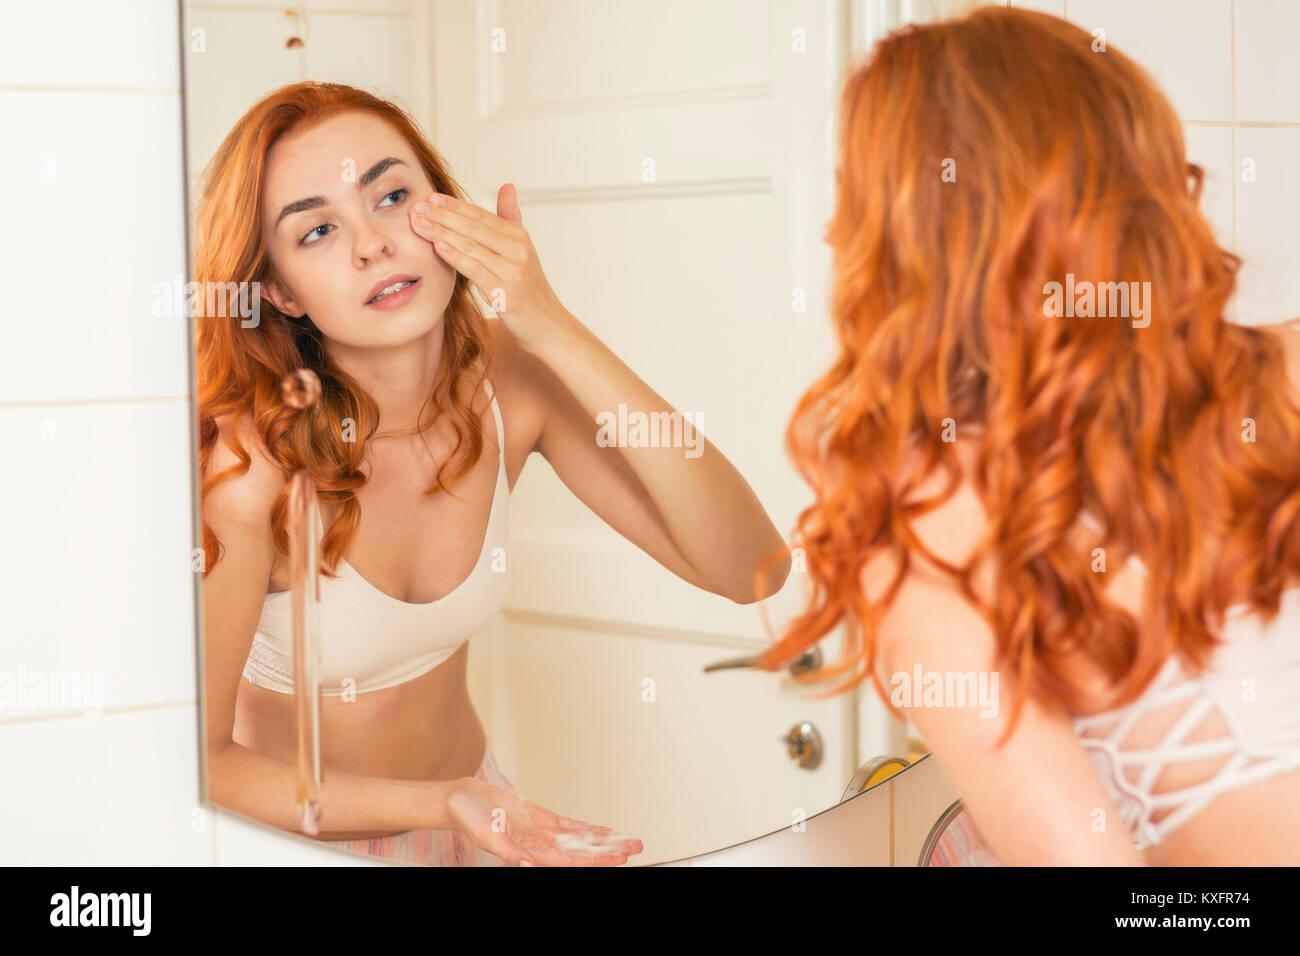 Woman applying face cream in bathroom - Stock Image